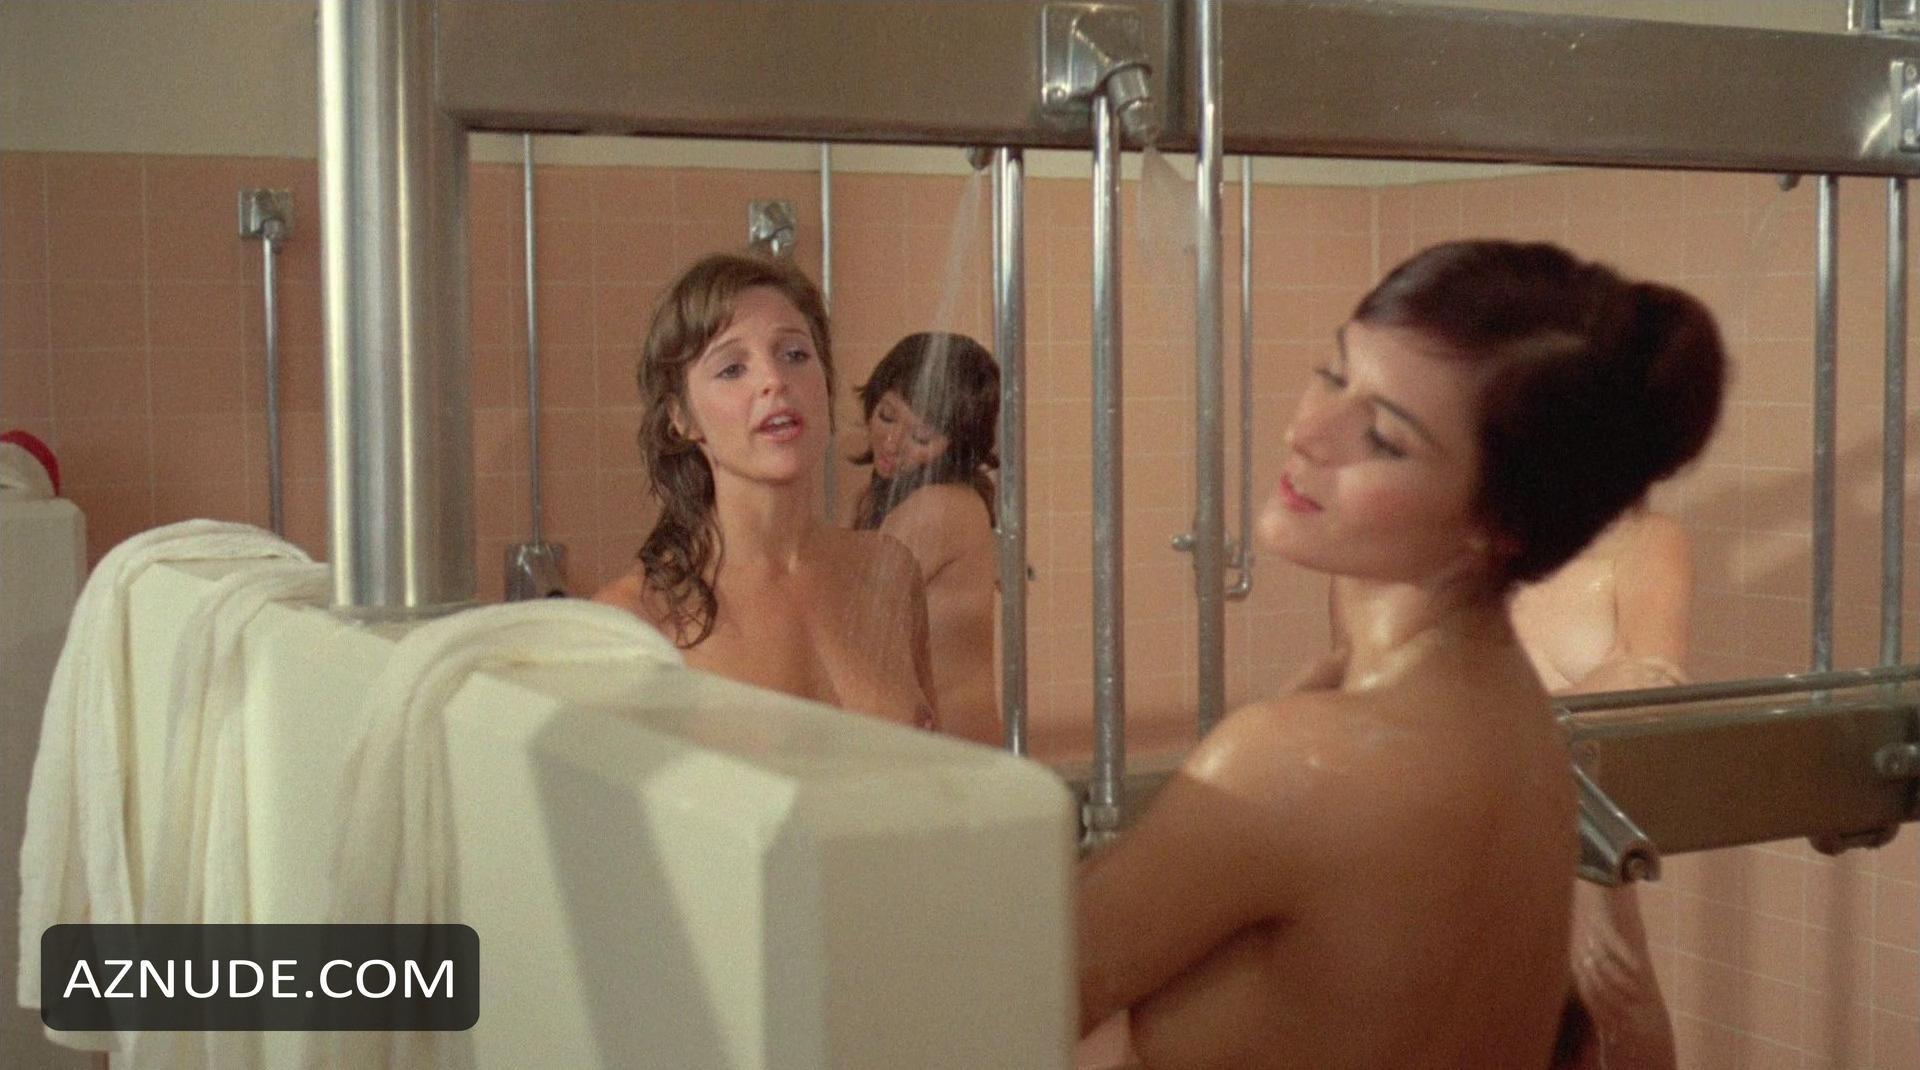 Lucy liu sex tape real hidden cam las vegas hotel room - 1 part 7